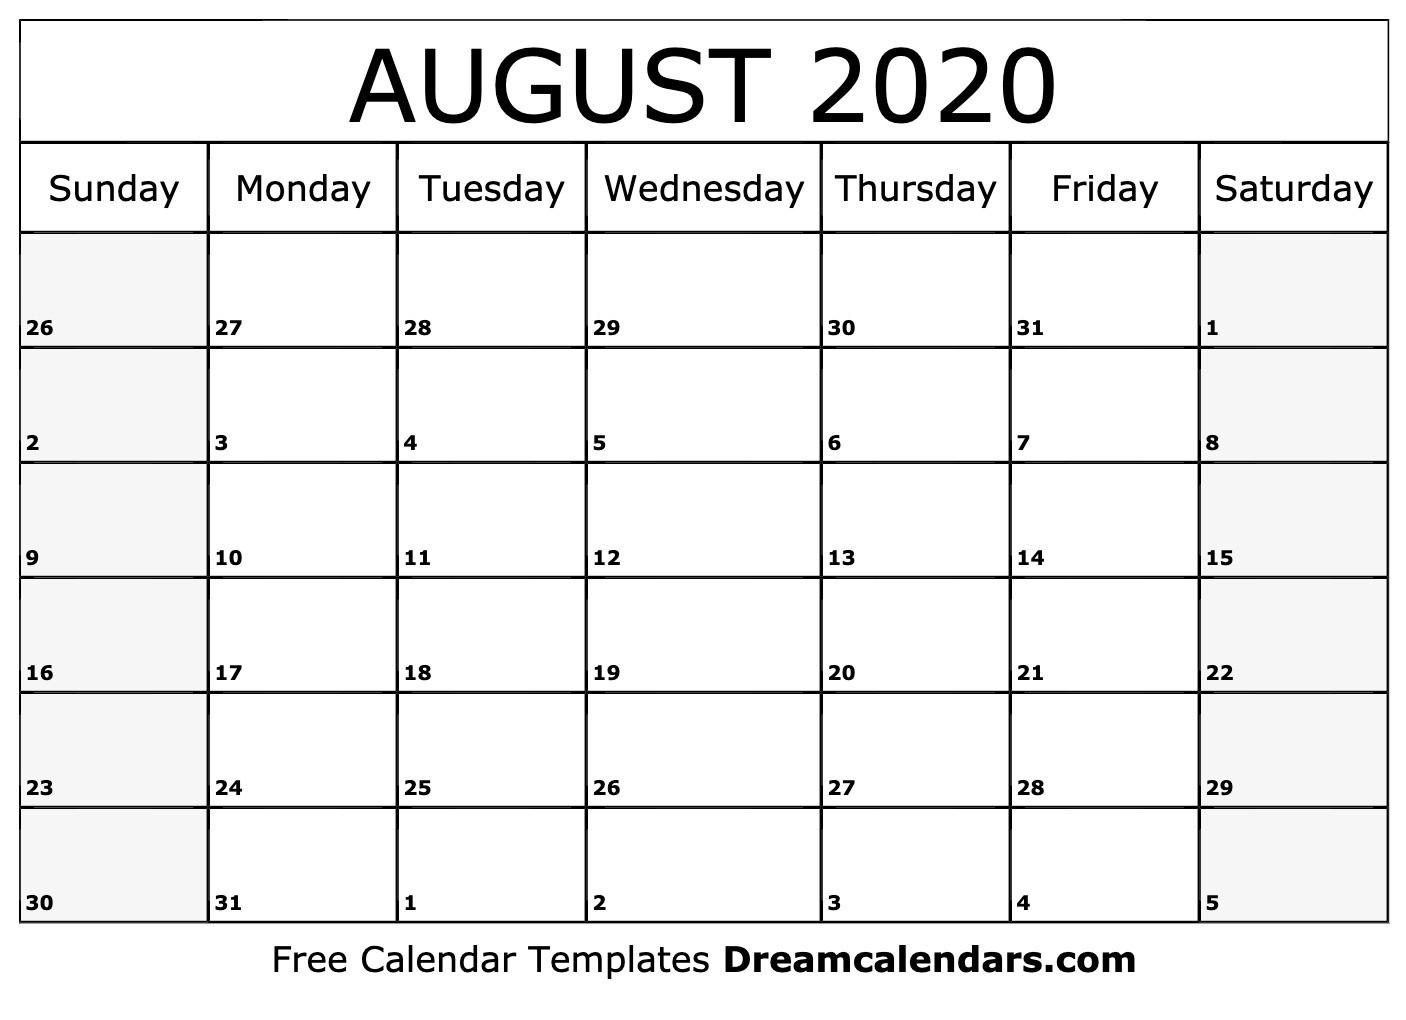 Printable August 2020 Calendar-3 Month Blank Calendar June-August 2020